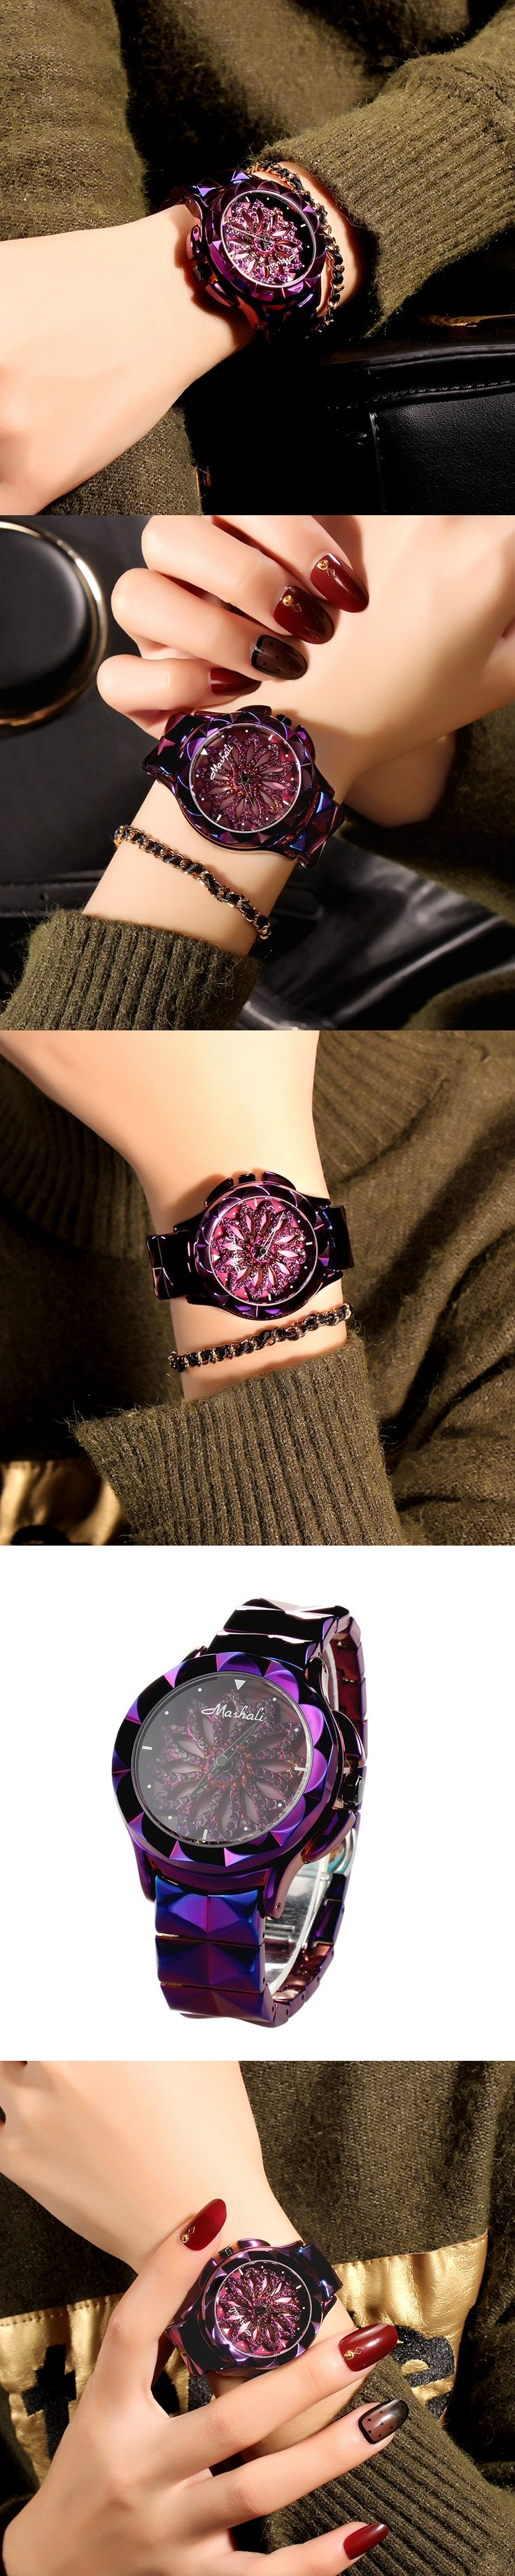 2017 Lucky Flower Women Purple Watches Lady Shining Rotation Dress Watch Stainless Steel Wristwatch Clocks Hours Female Relogio